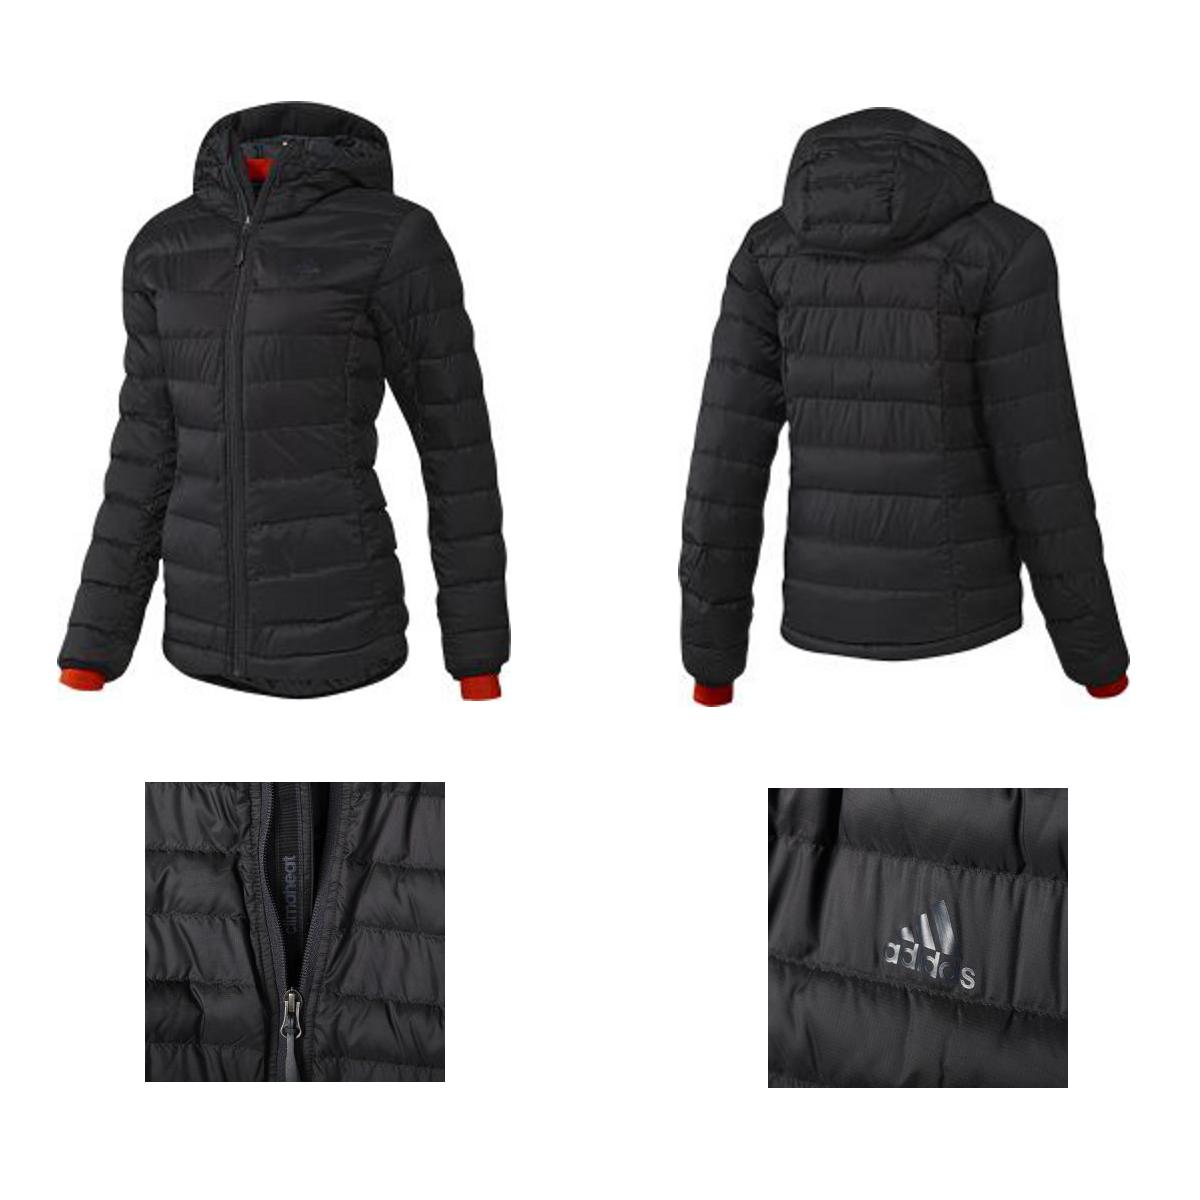 adidas aa2063 w climaheat frostlight winterjacke damen. Black Bedroom Furniture Sets. Home Design Ideas